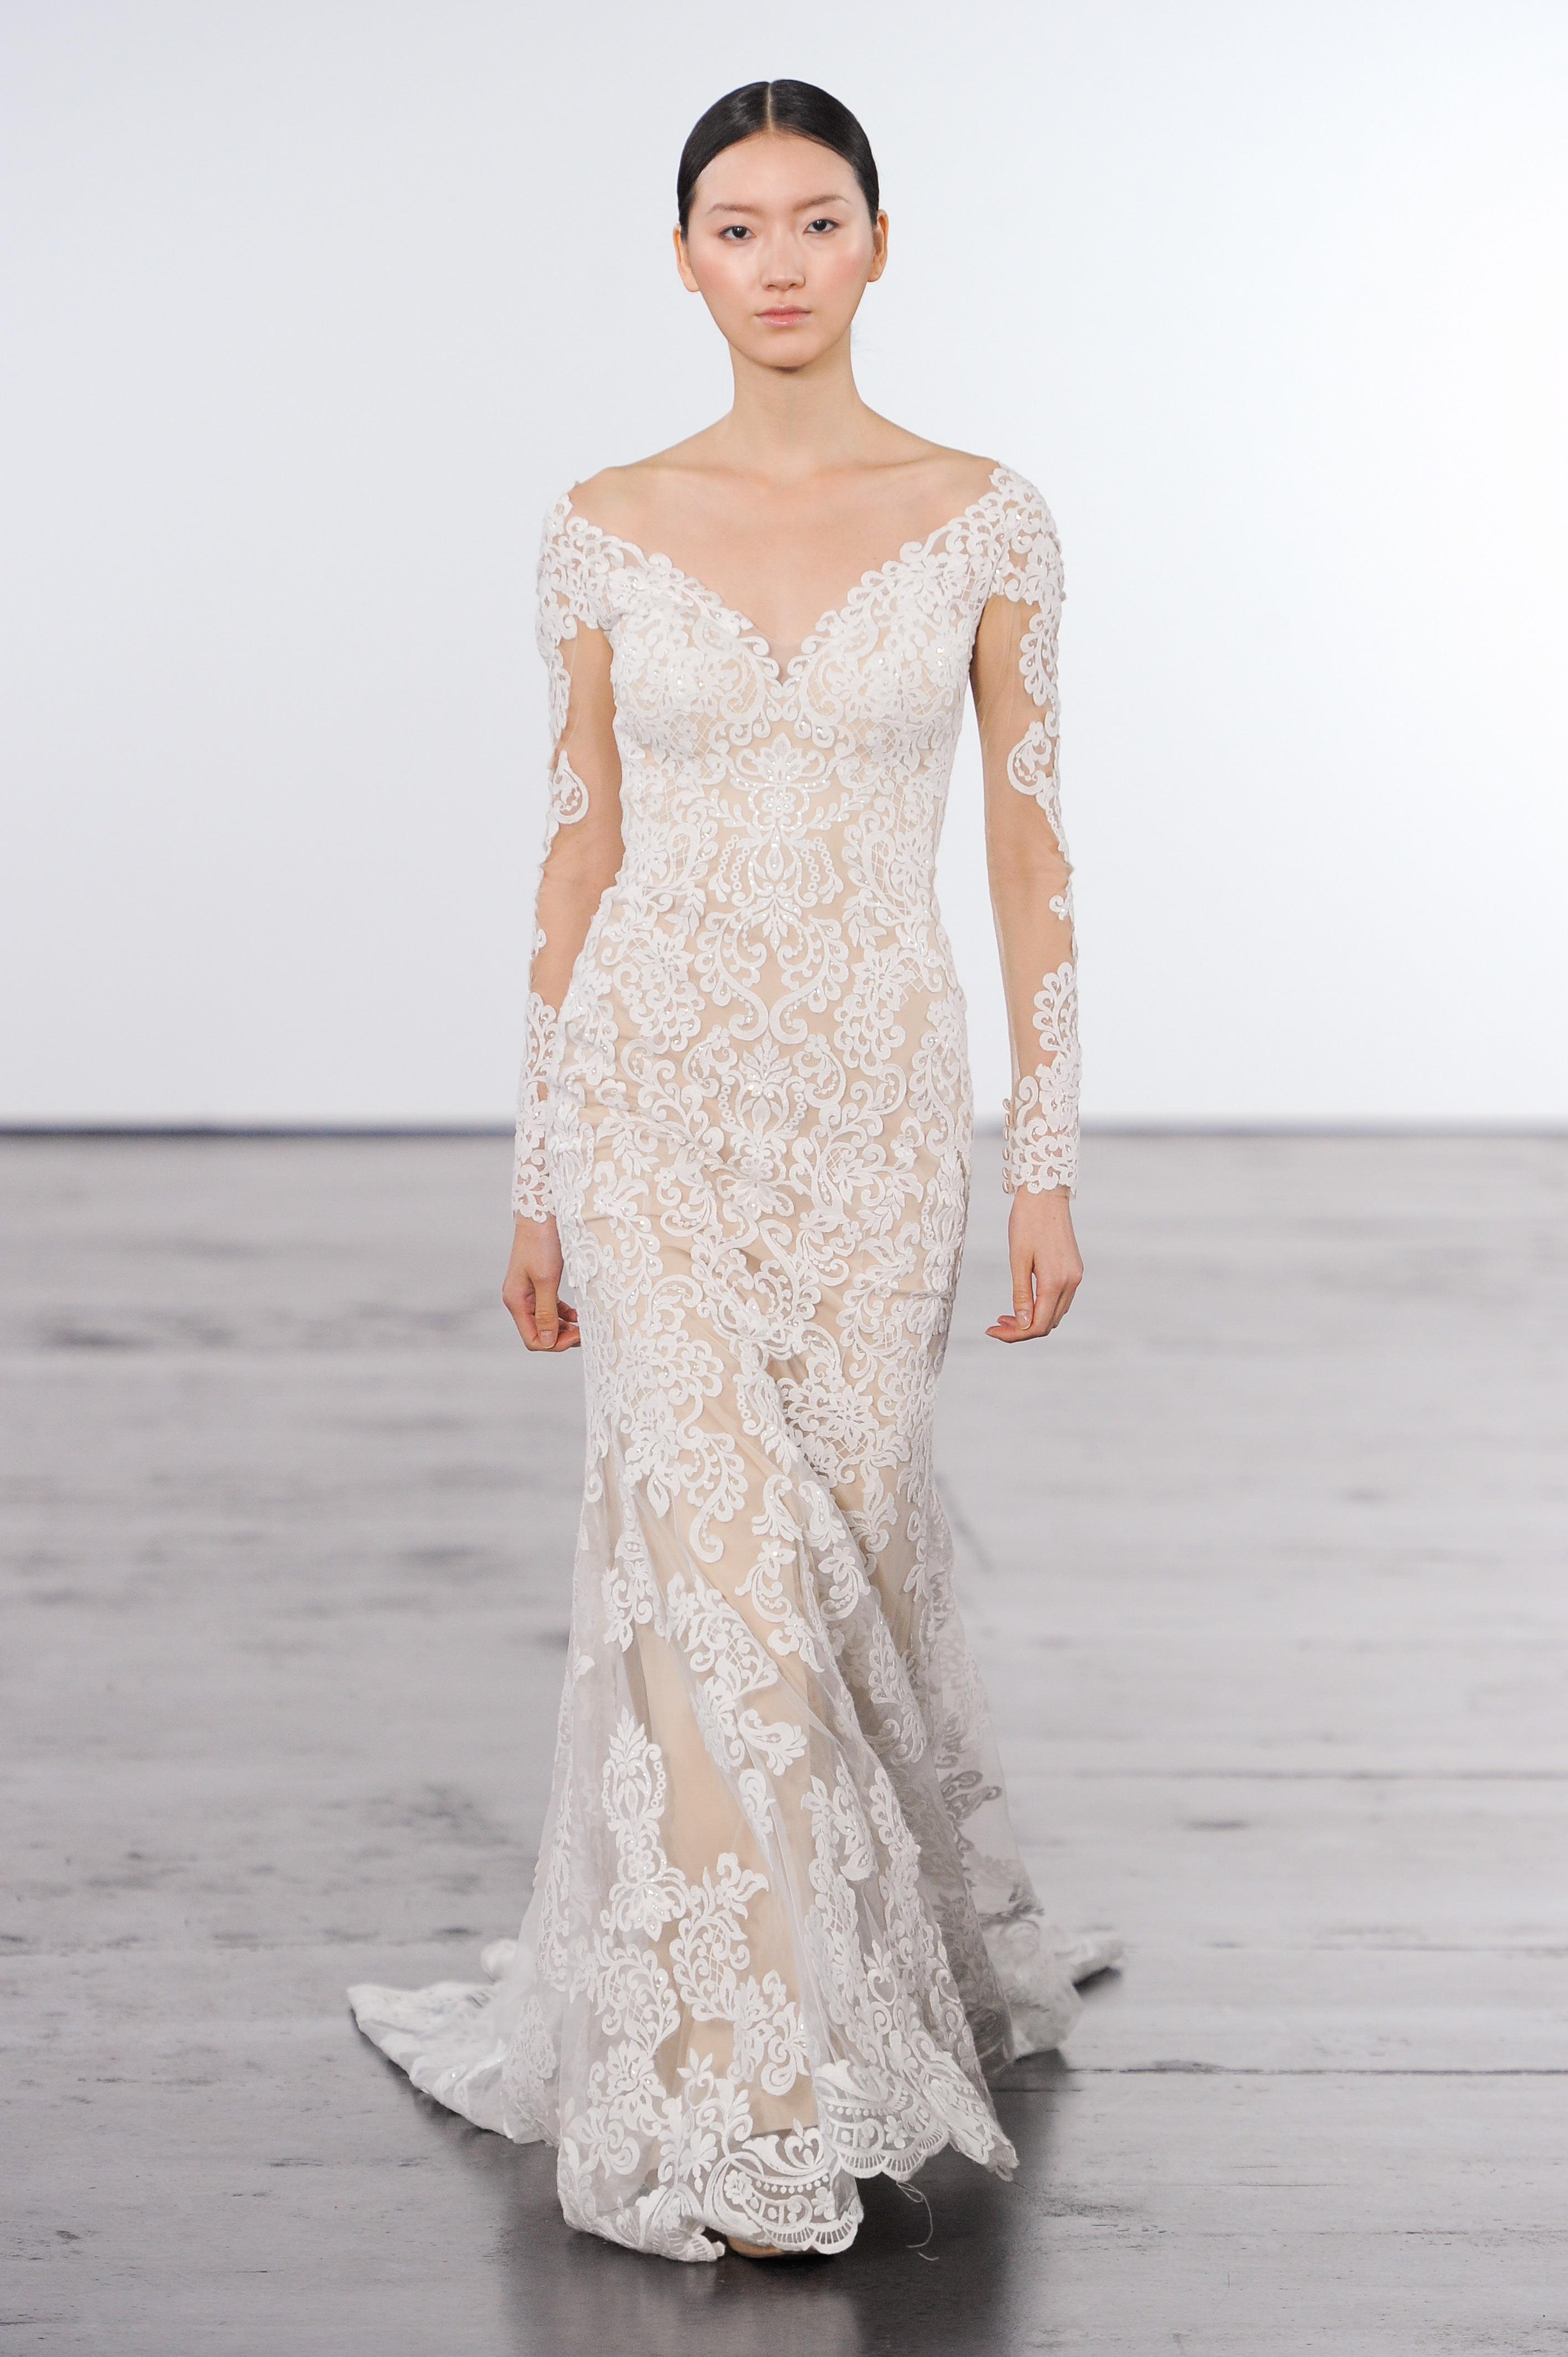 dennis basso wedding dress fall 2018 lace sheath v-neck